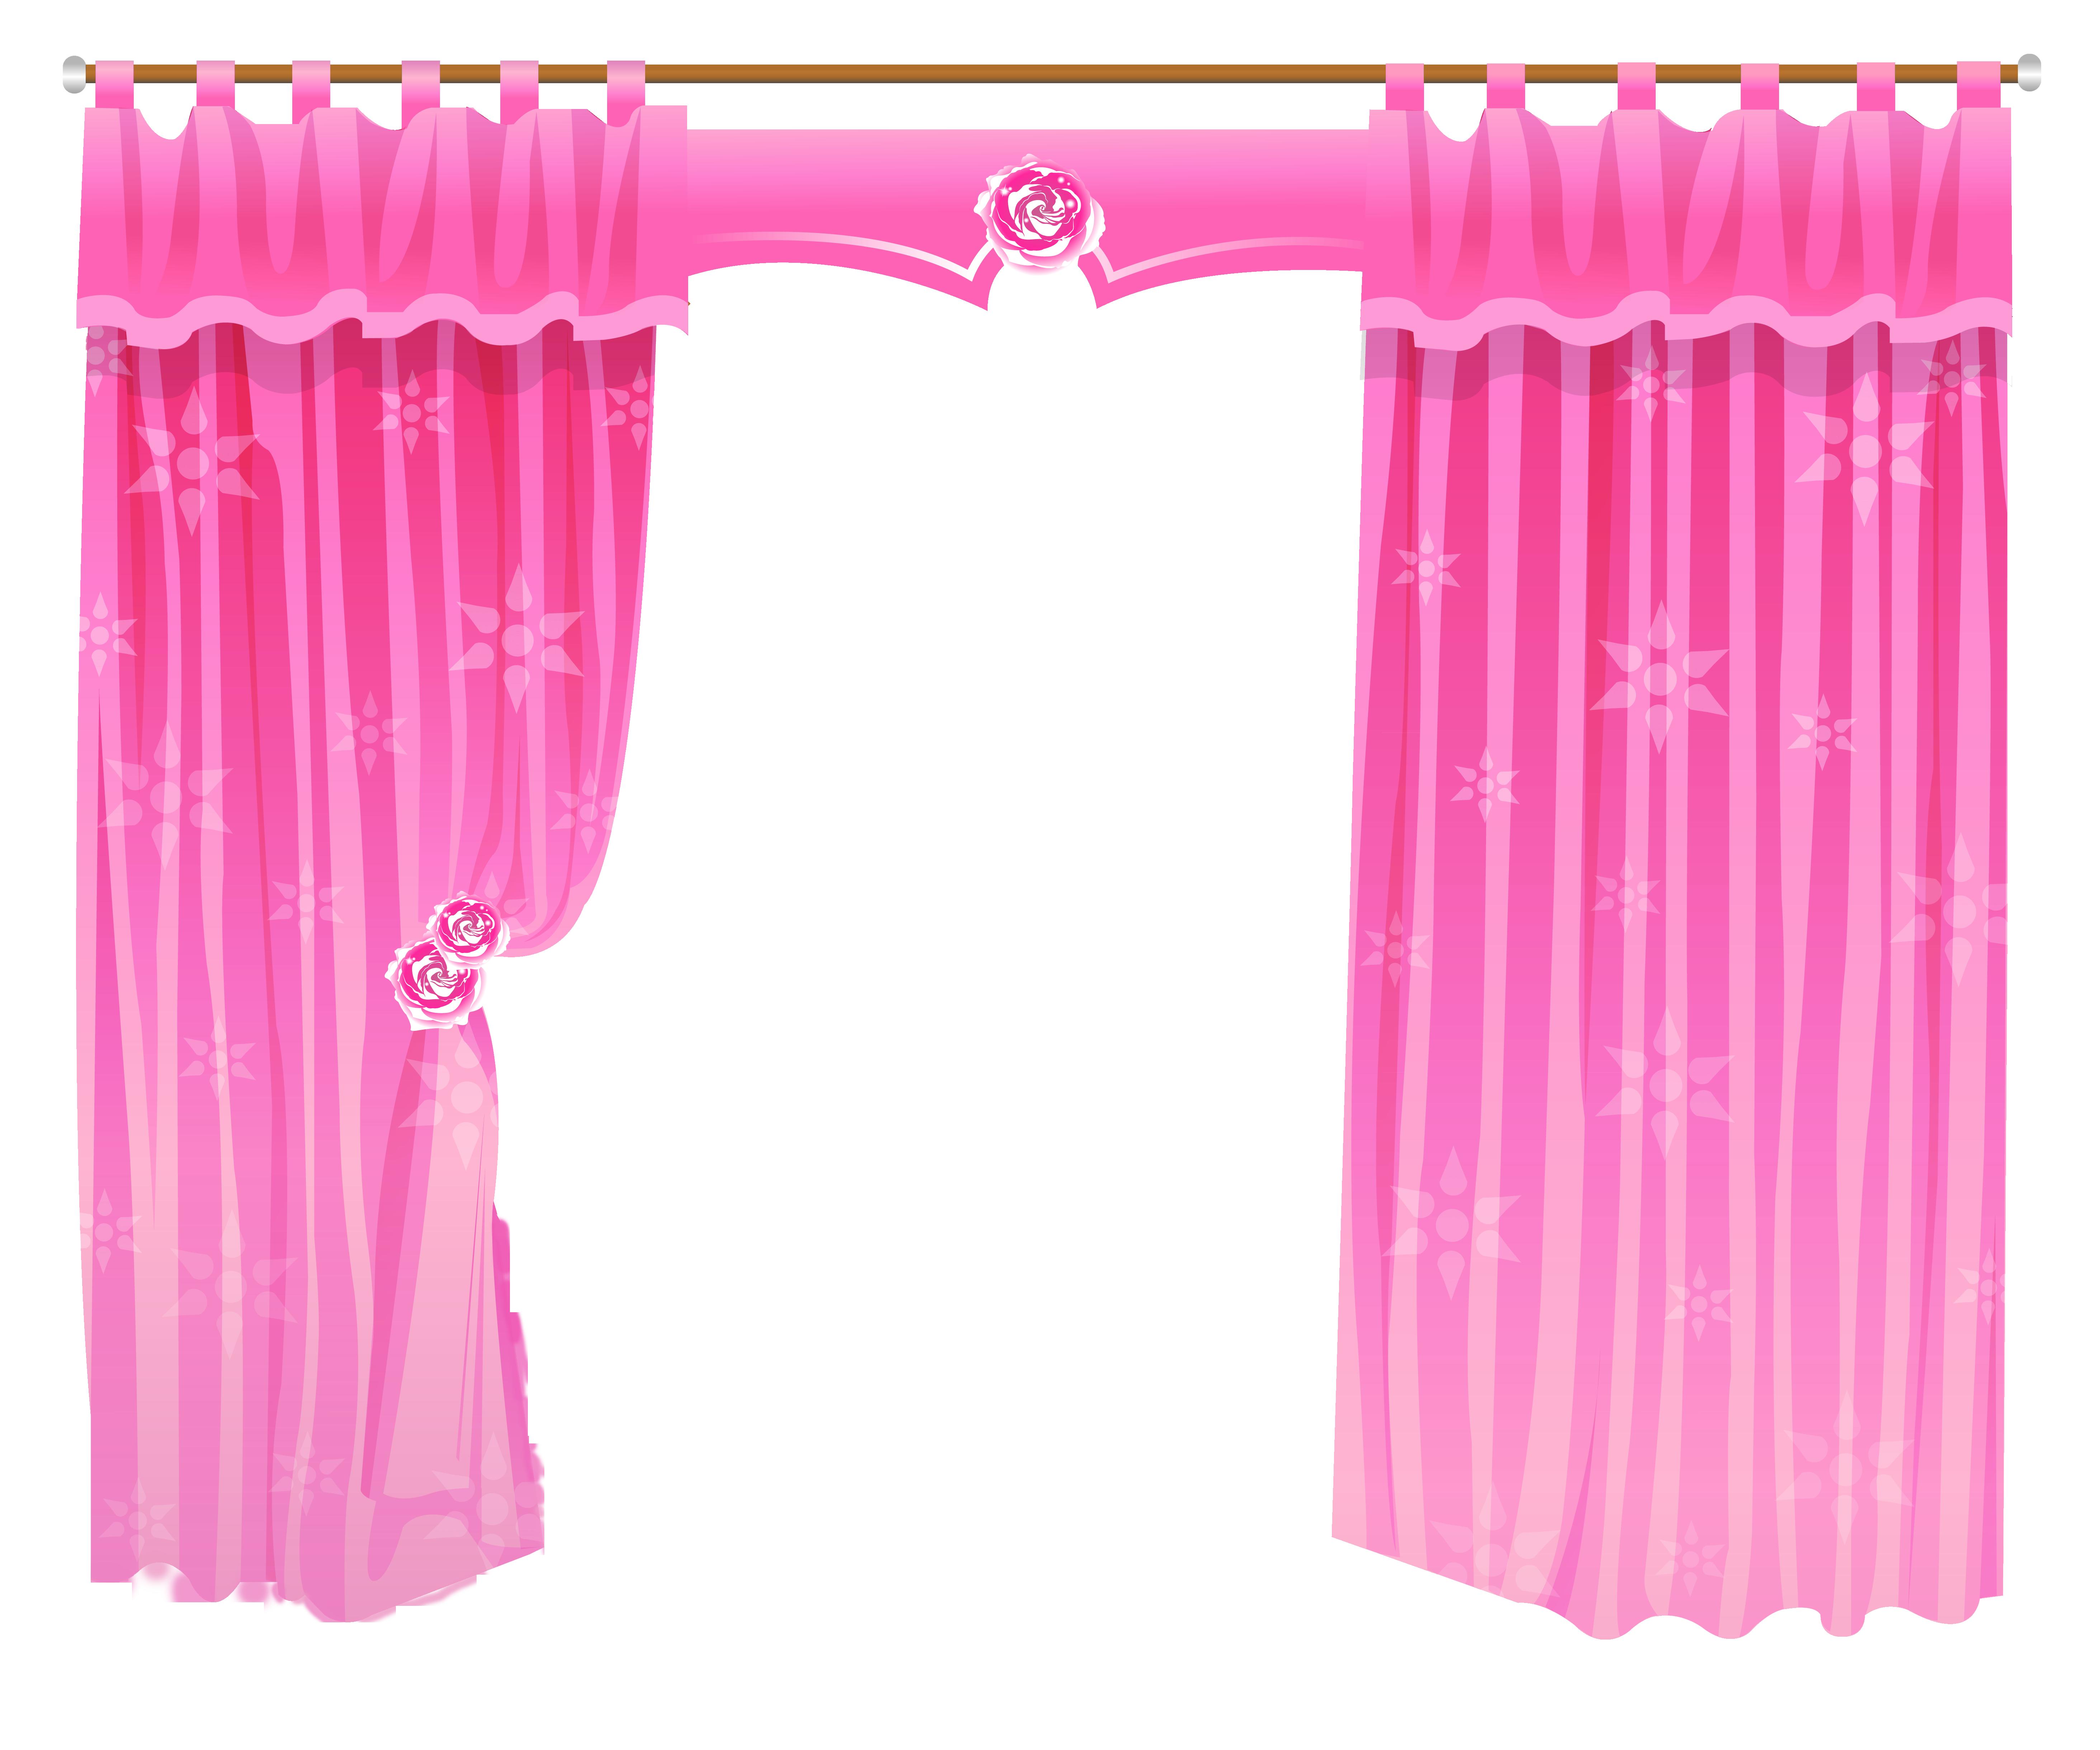 Curtain cliparts pink. Gate clipart mandap